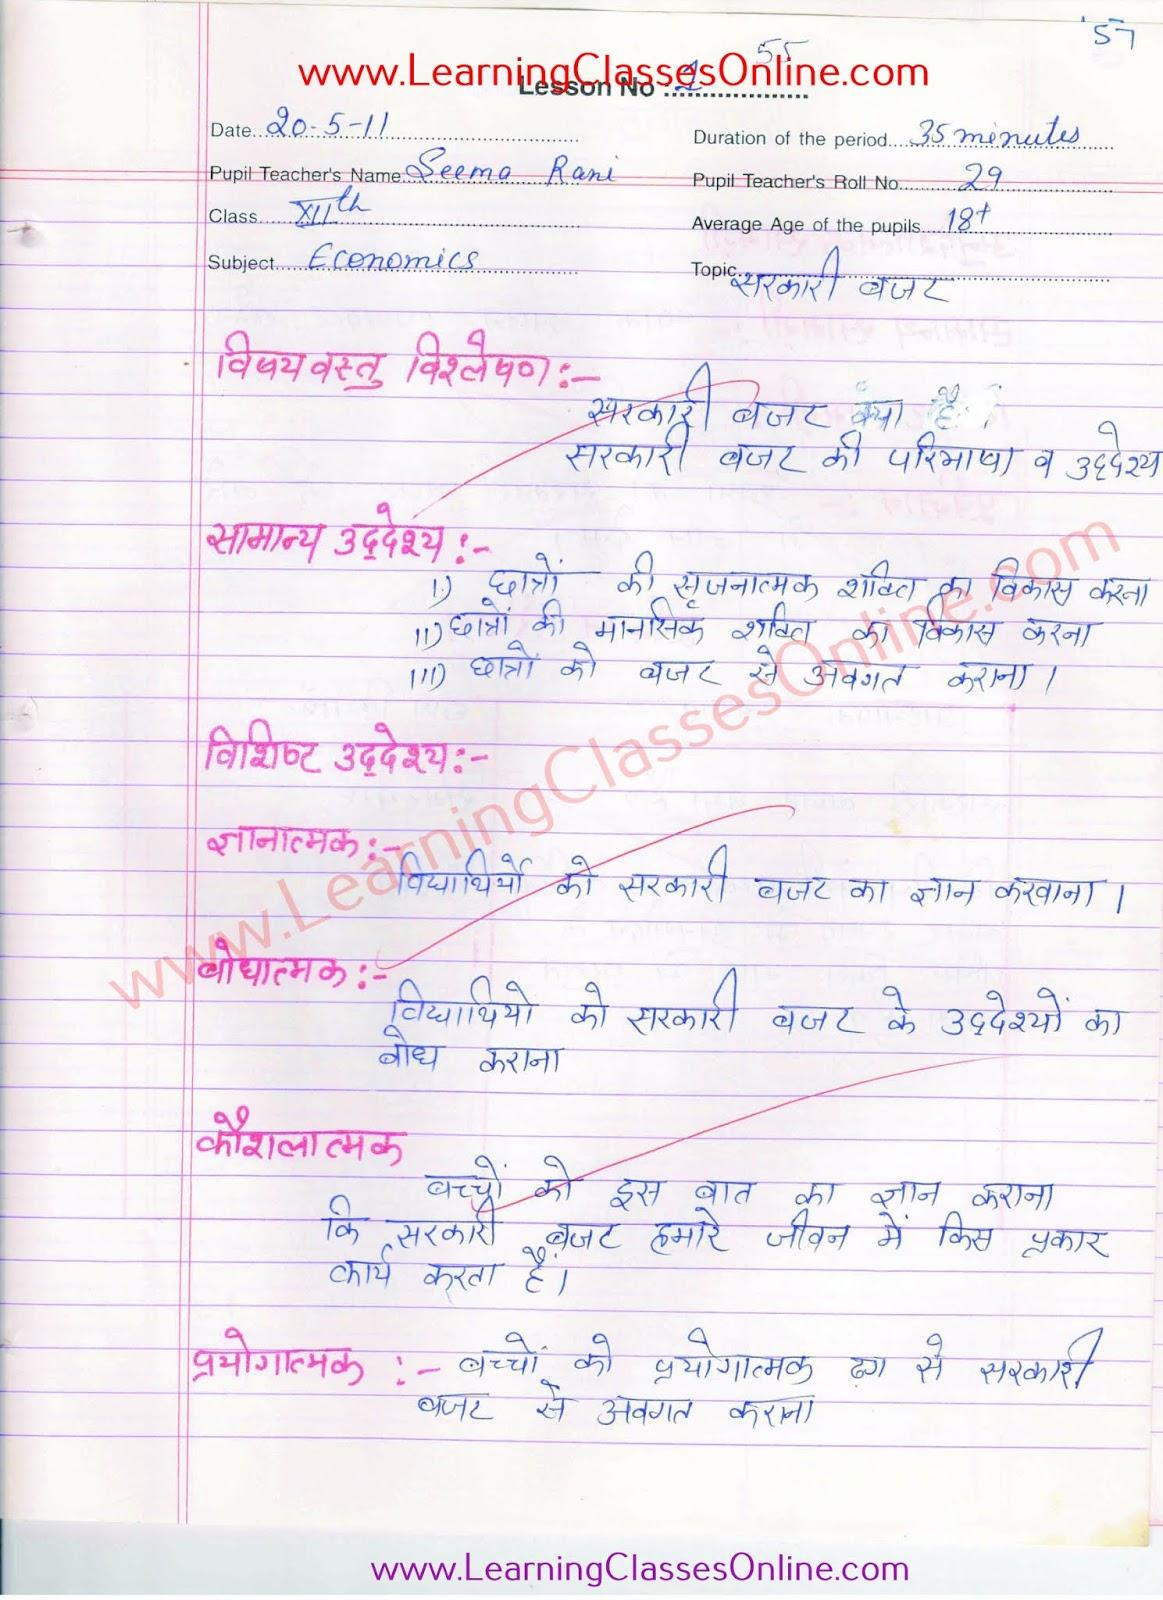 Budget Lesson Plan in Hindi - Sarkari Budget ( government budget) economics lesson plan in hindi for class 10 free download pdf